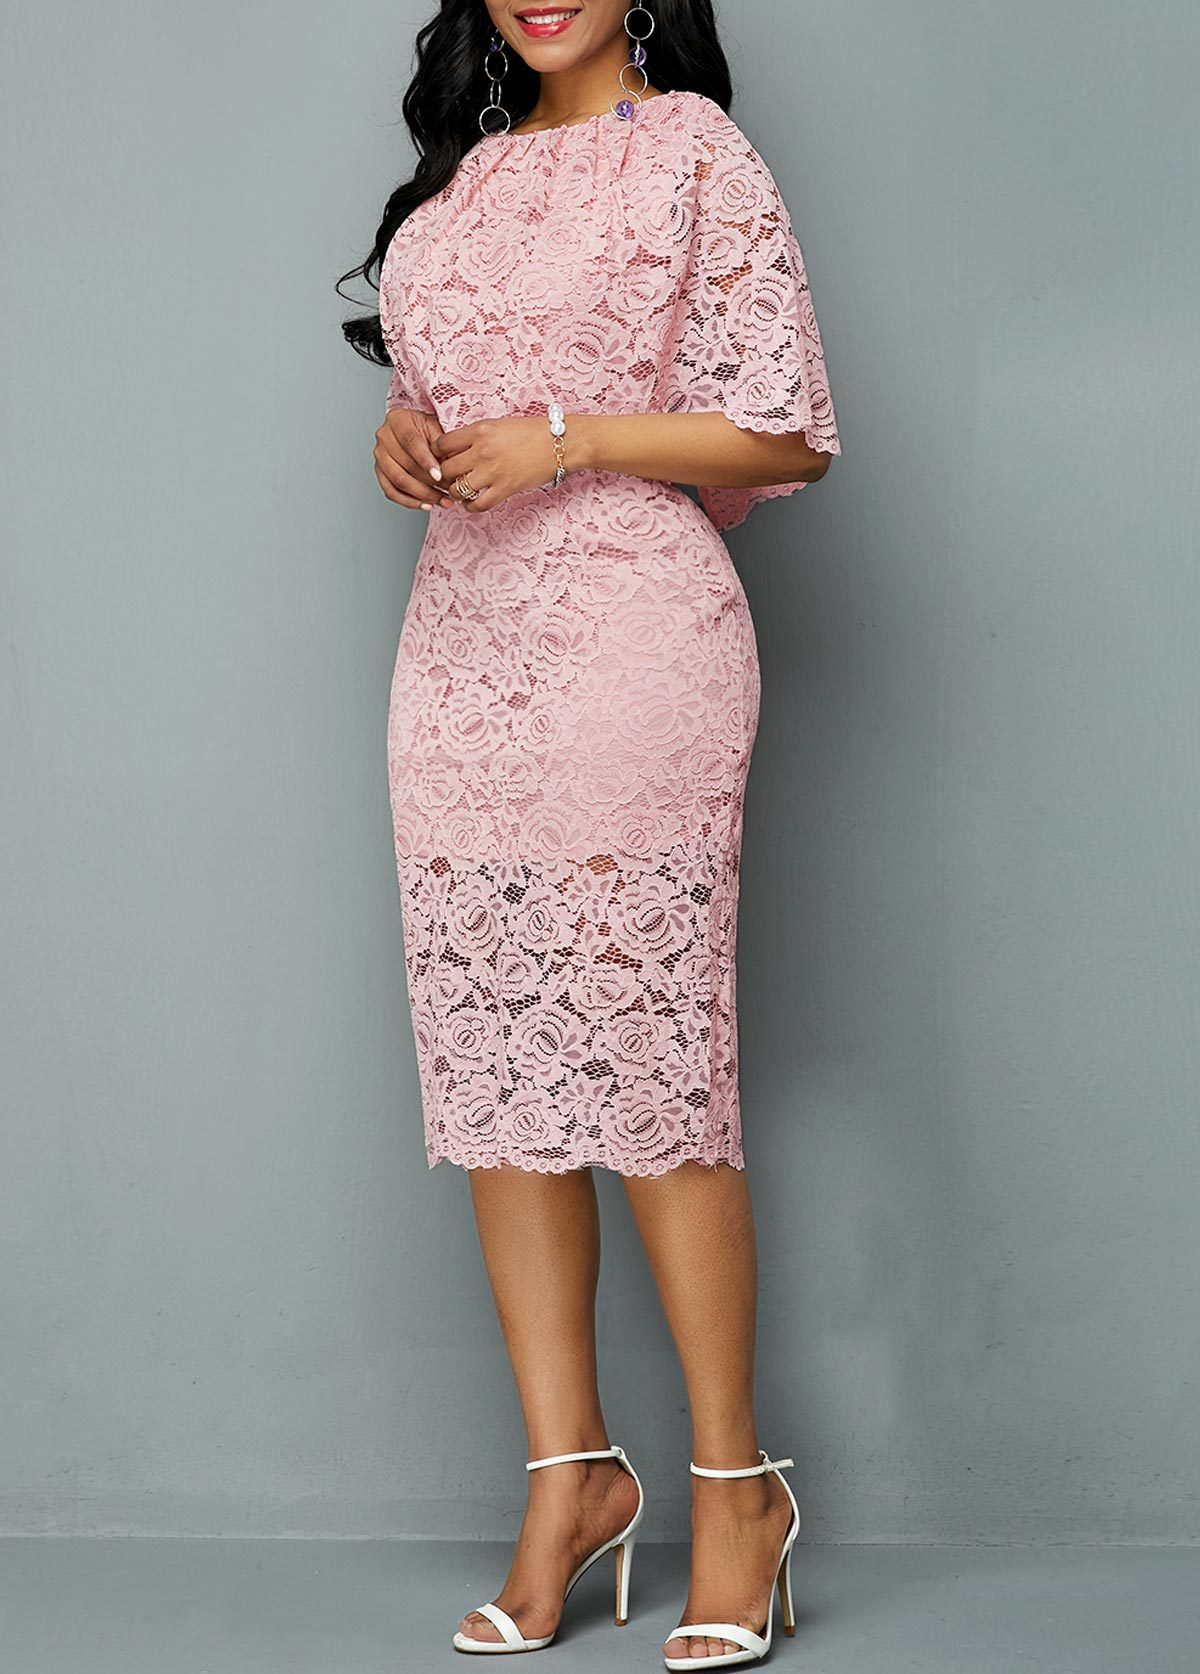 Large Size Dress Round Neck Lace Cutout Dress Female Elegant Five-point Sleeves Slim Party Large Size Dress Female Vestidos 5xl 2